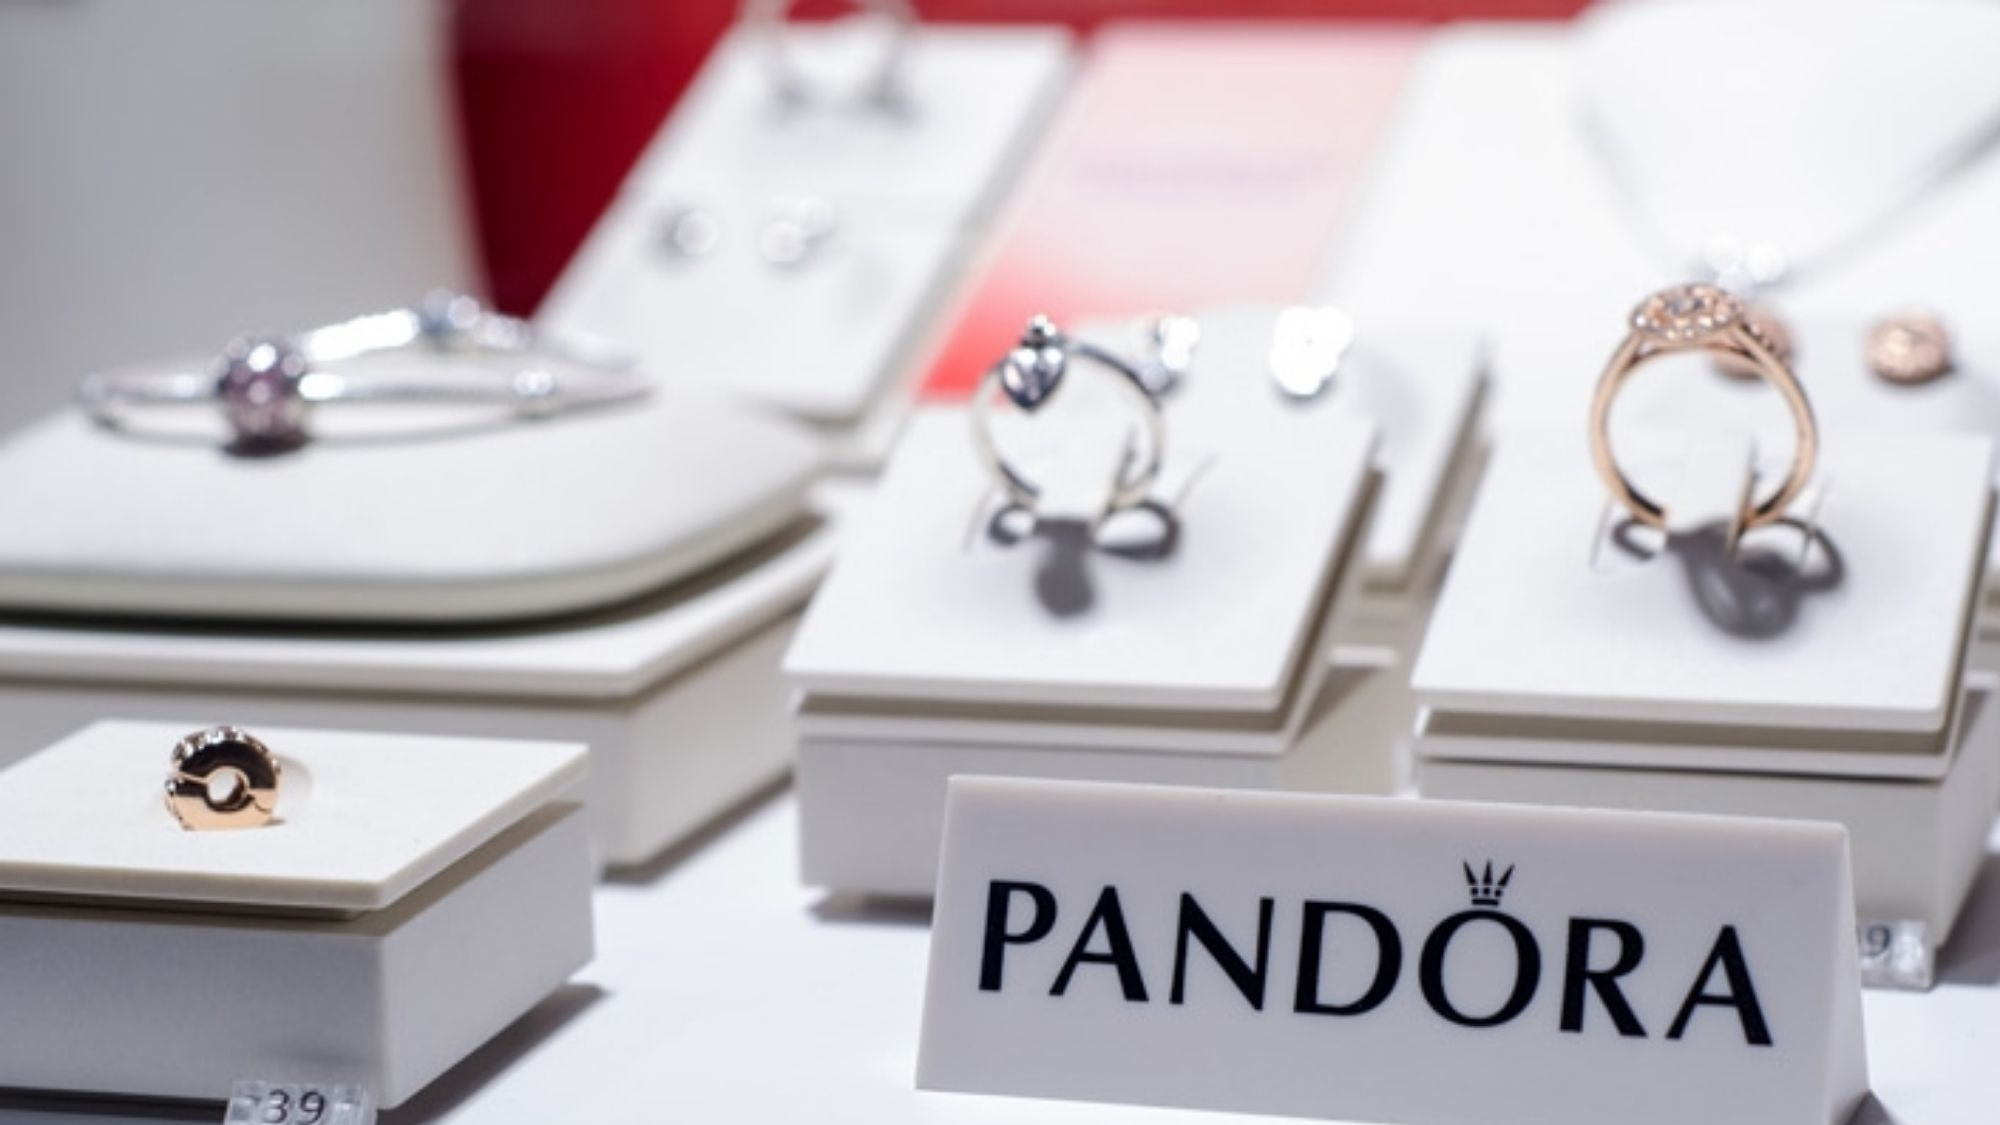 Saving the environment; jewelry brand Pandora to ditch mined diamonds